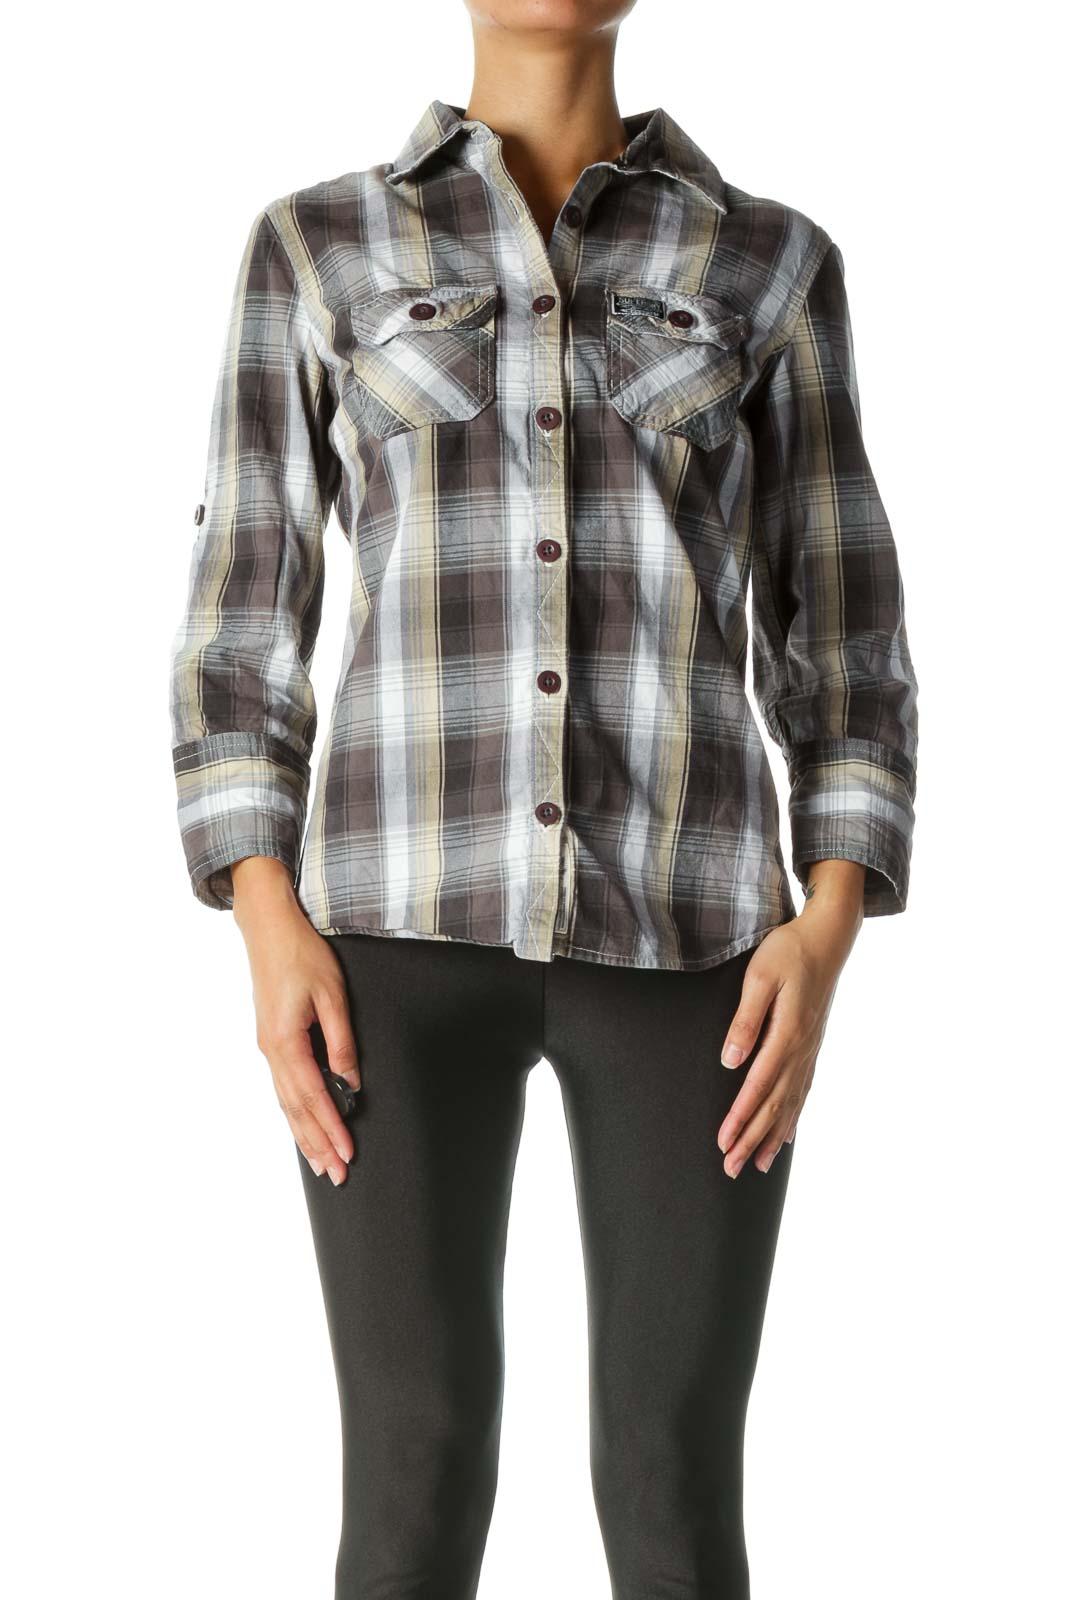 Grey, Beige, And White Plaid Button-Down Shirt